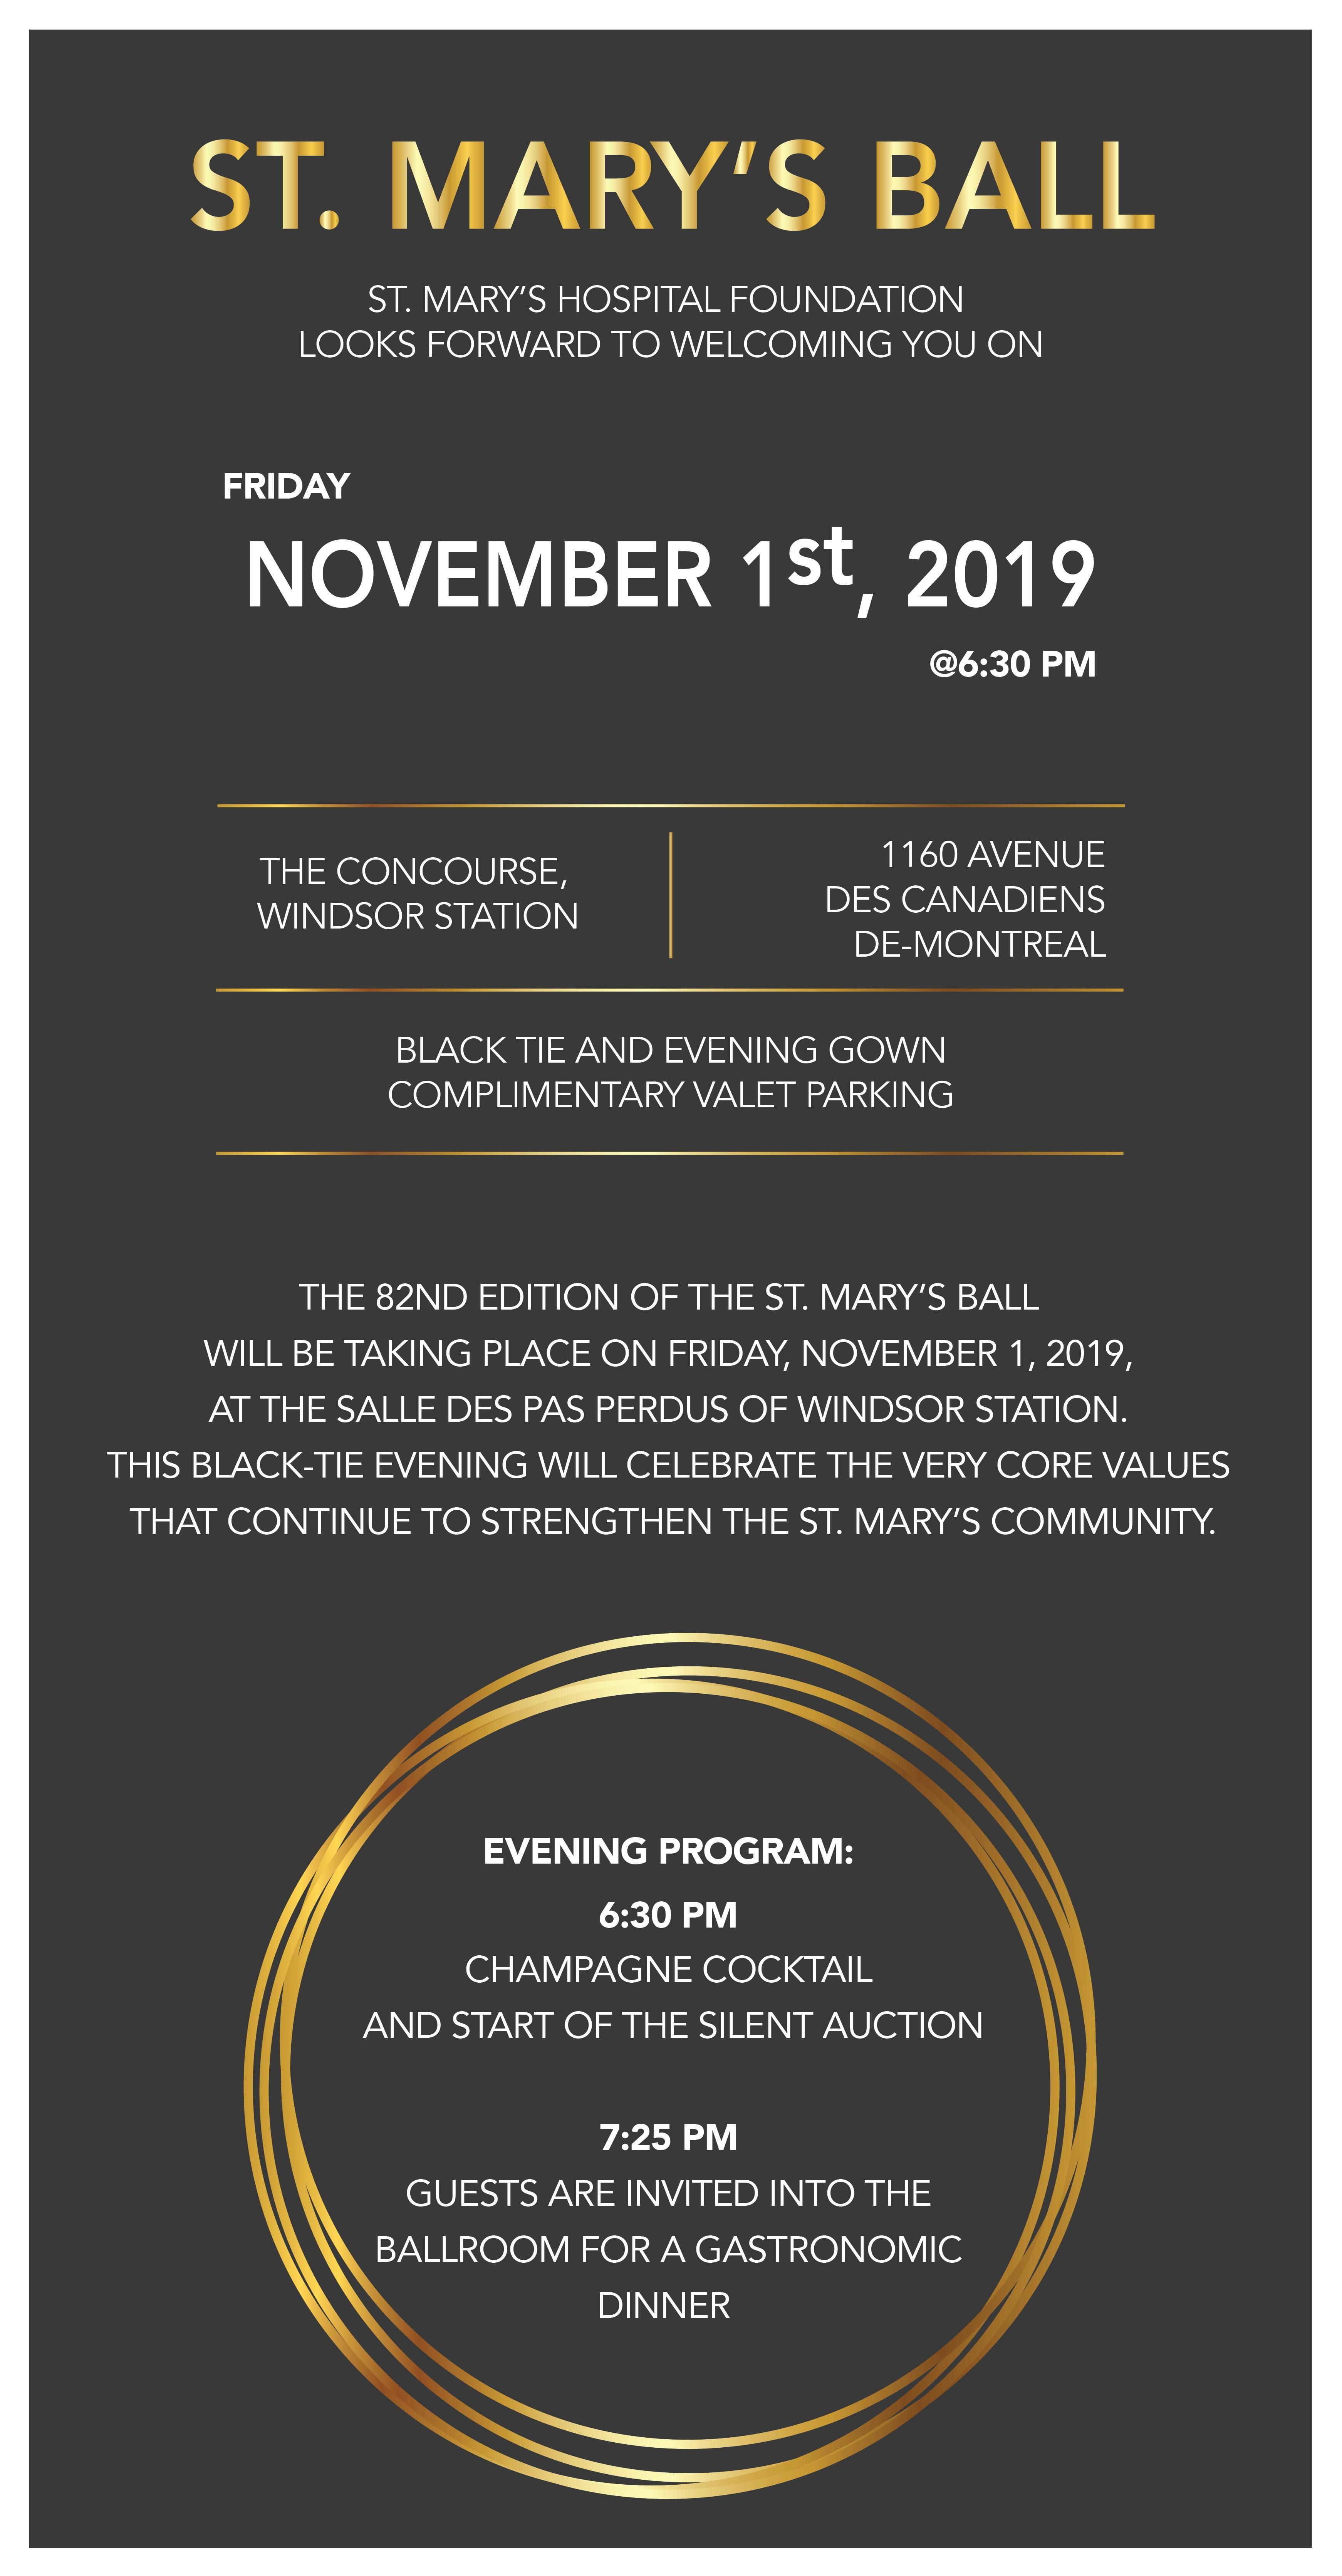 St. Mary's 82nd Ball - November 1, 2019